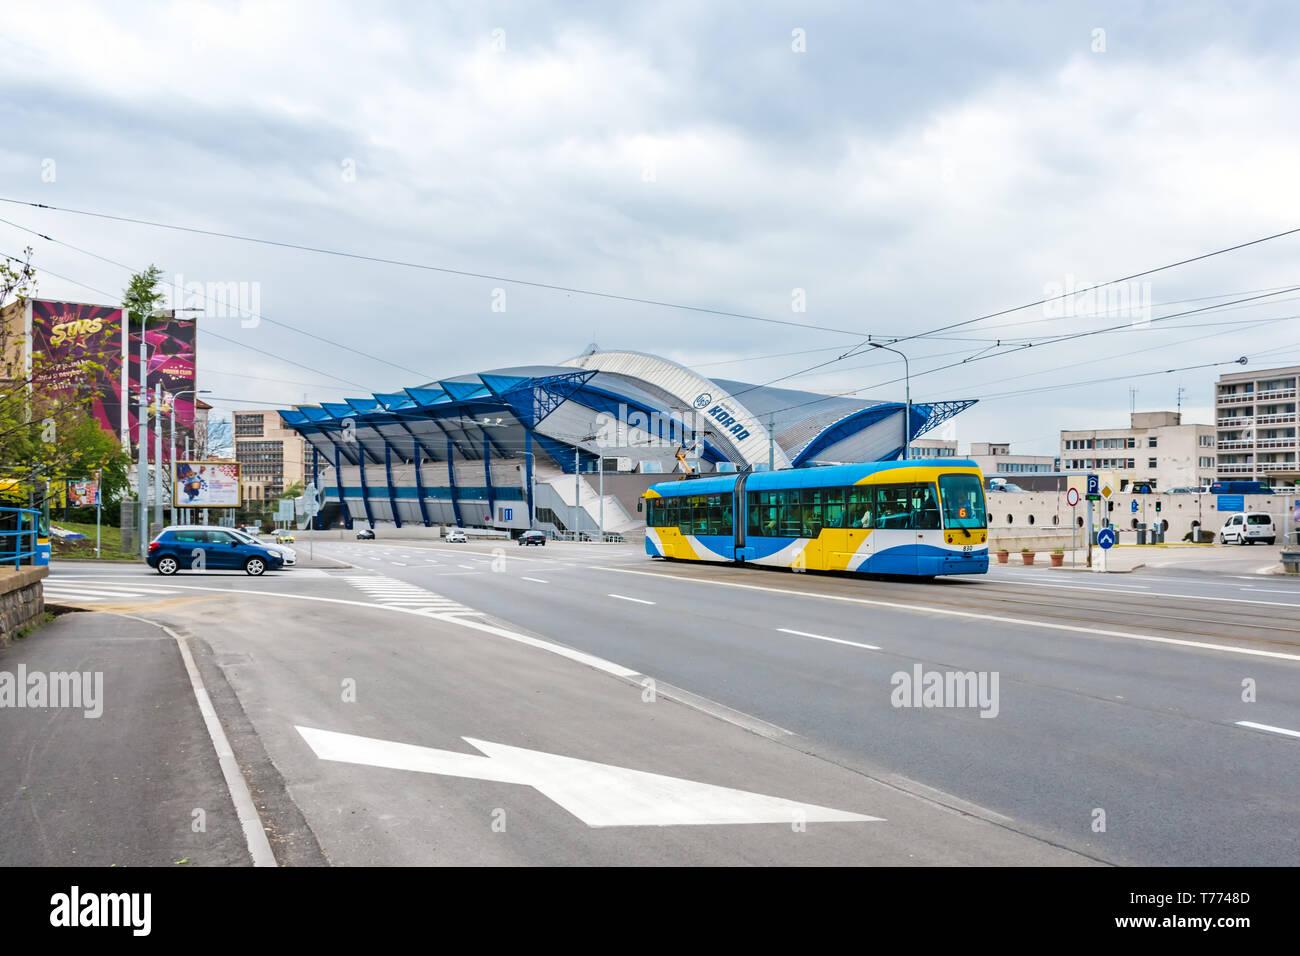 KOSICE, SLOVAKIA – APRIL 29 2019: Side view of Steel Arena – Ice hockey stadium where IIHF International Ice Hockey World Championship 2019 will be he - Stock Image